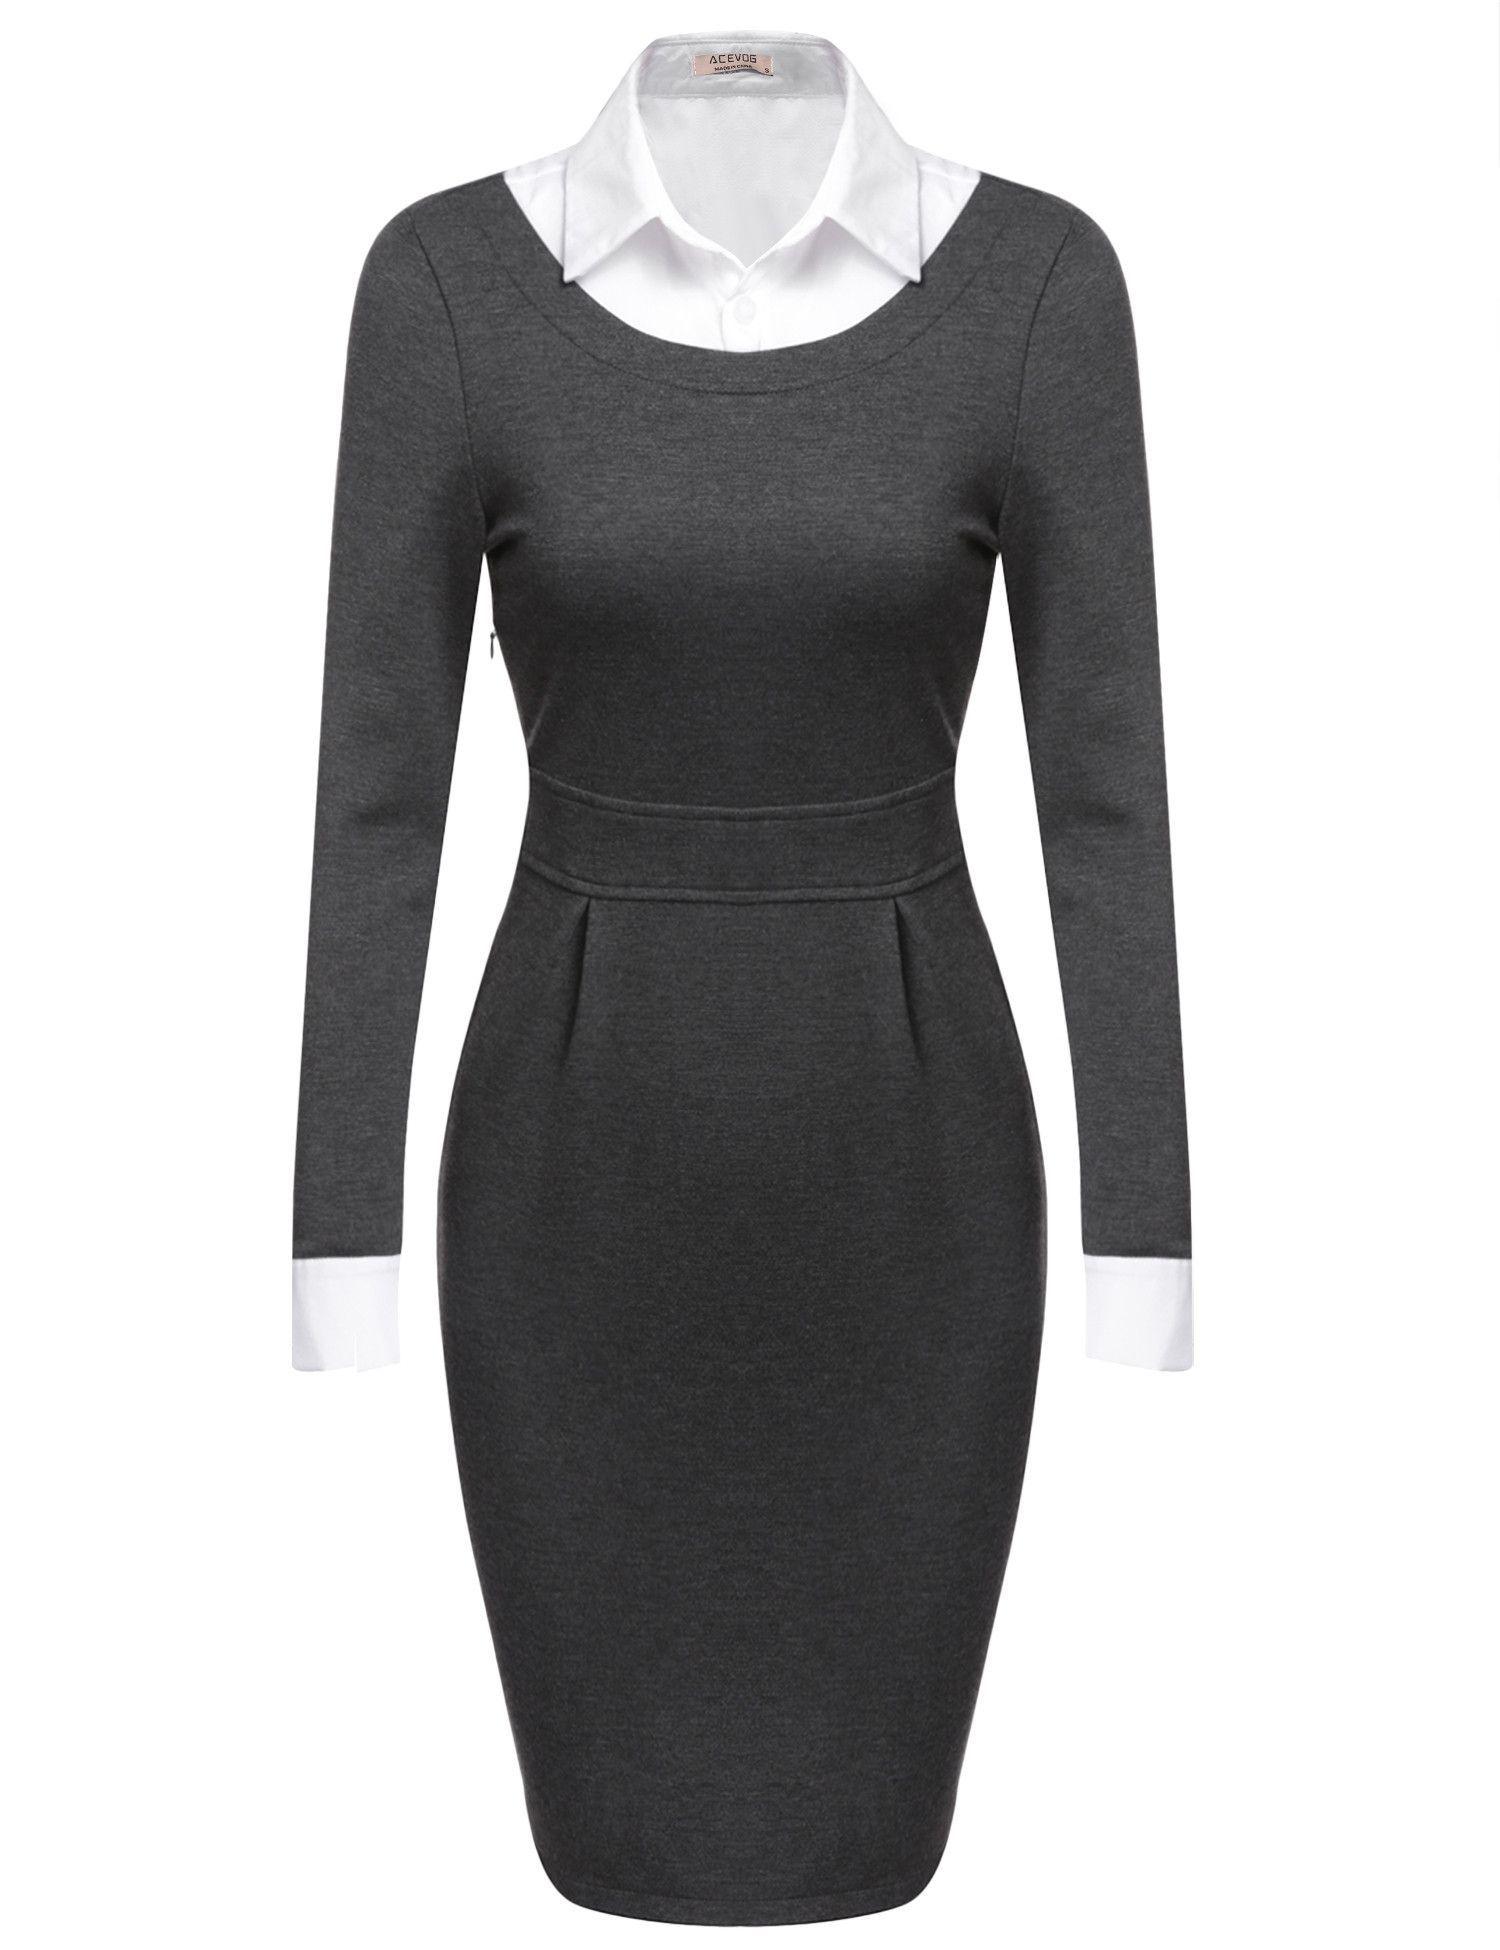 6785ee7c41d Dark gray Women Turn Down Collar Long Sleeve Bodycon Business Pencil Work  Dresses